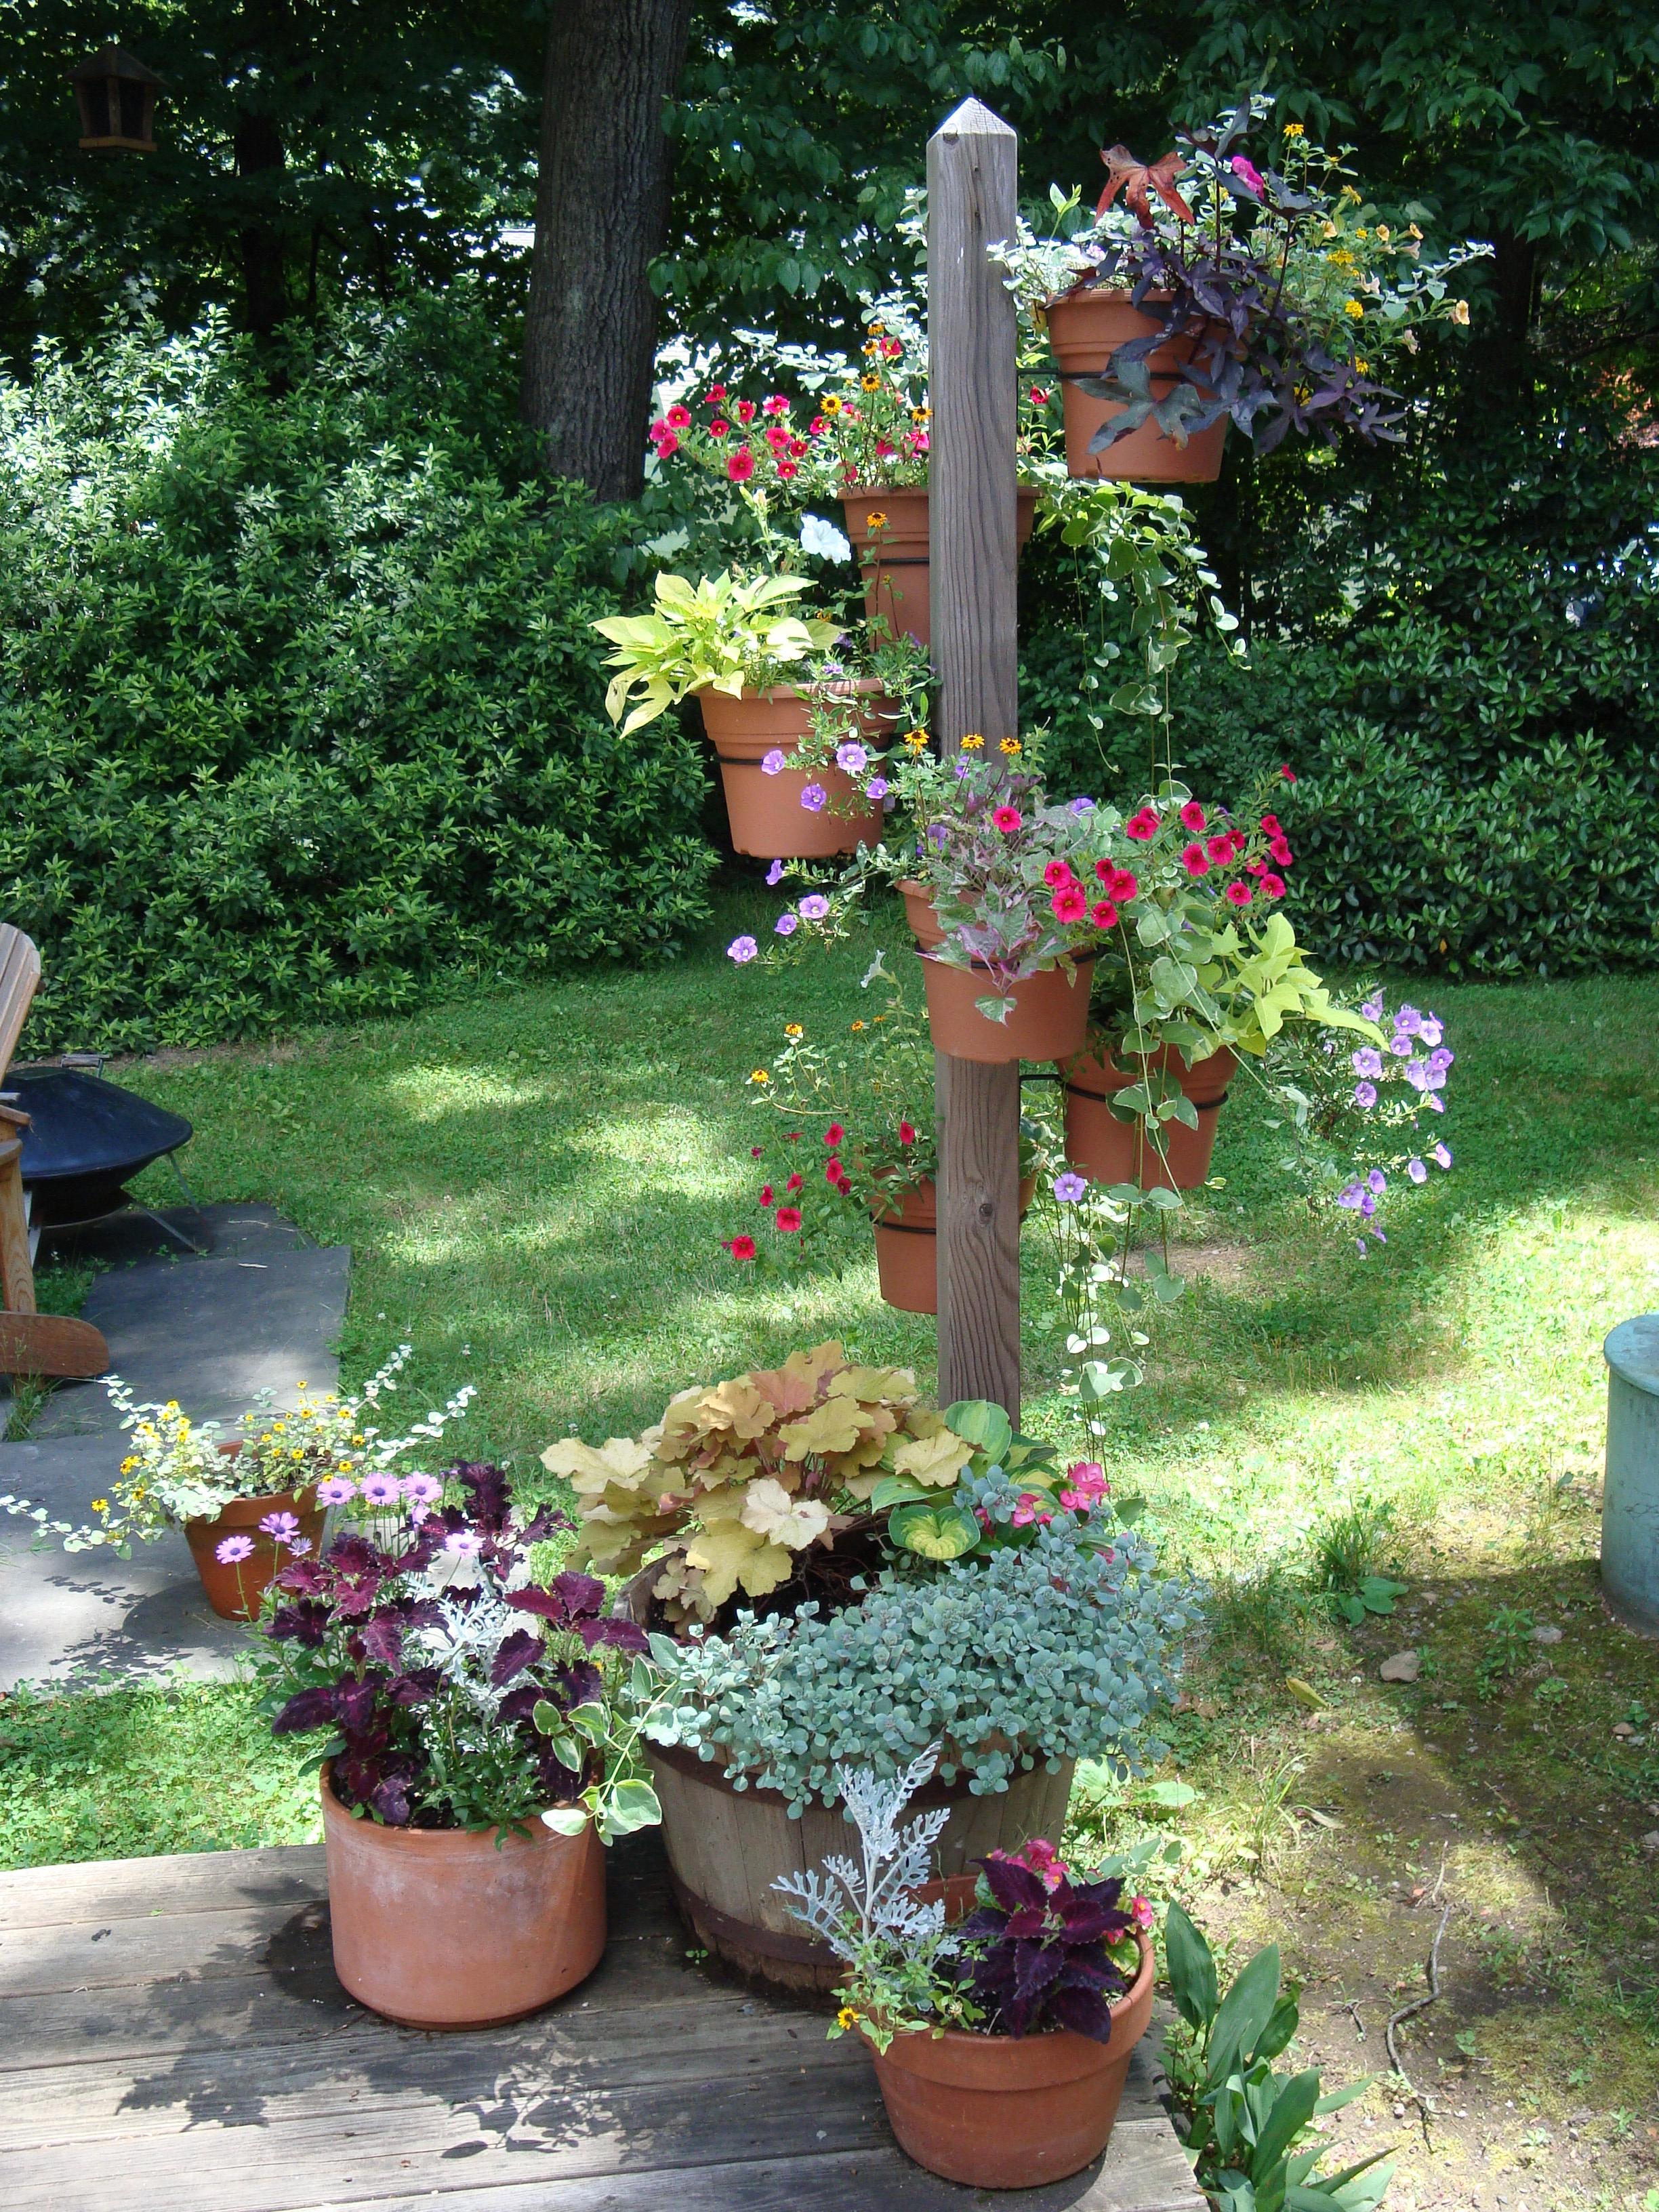 Garden designers roundtable vertical accents hanging pots on post workwithnaturefo